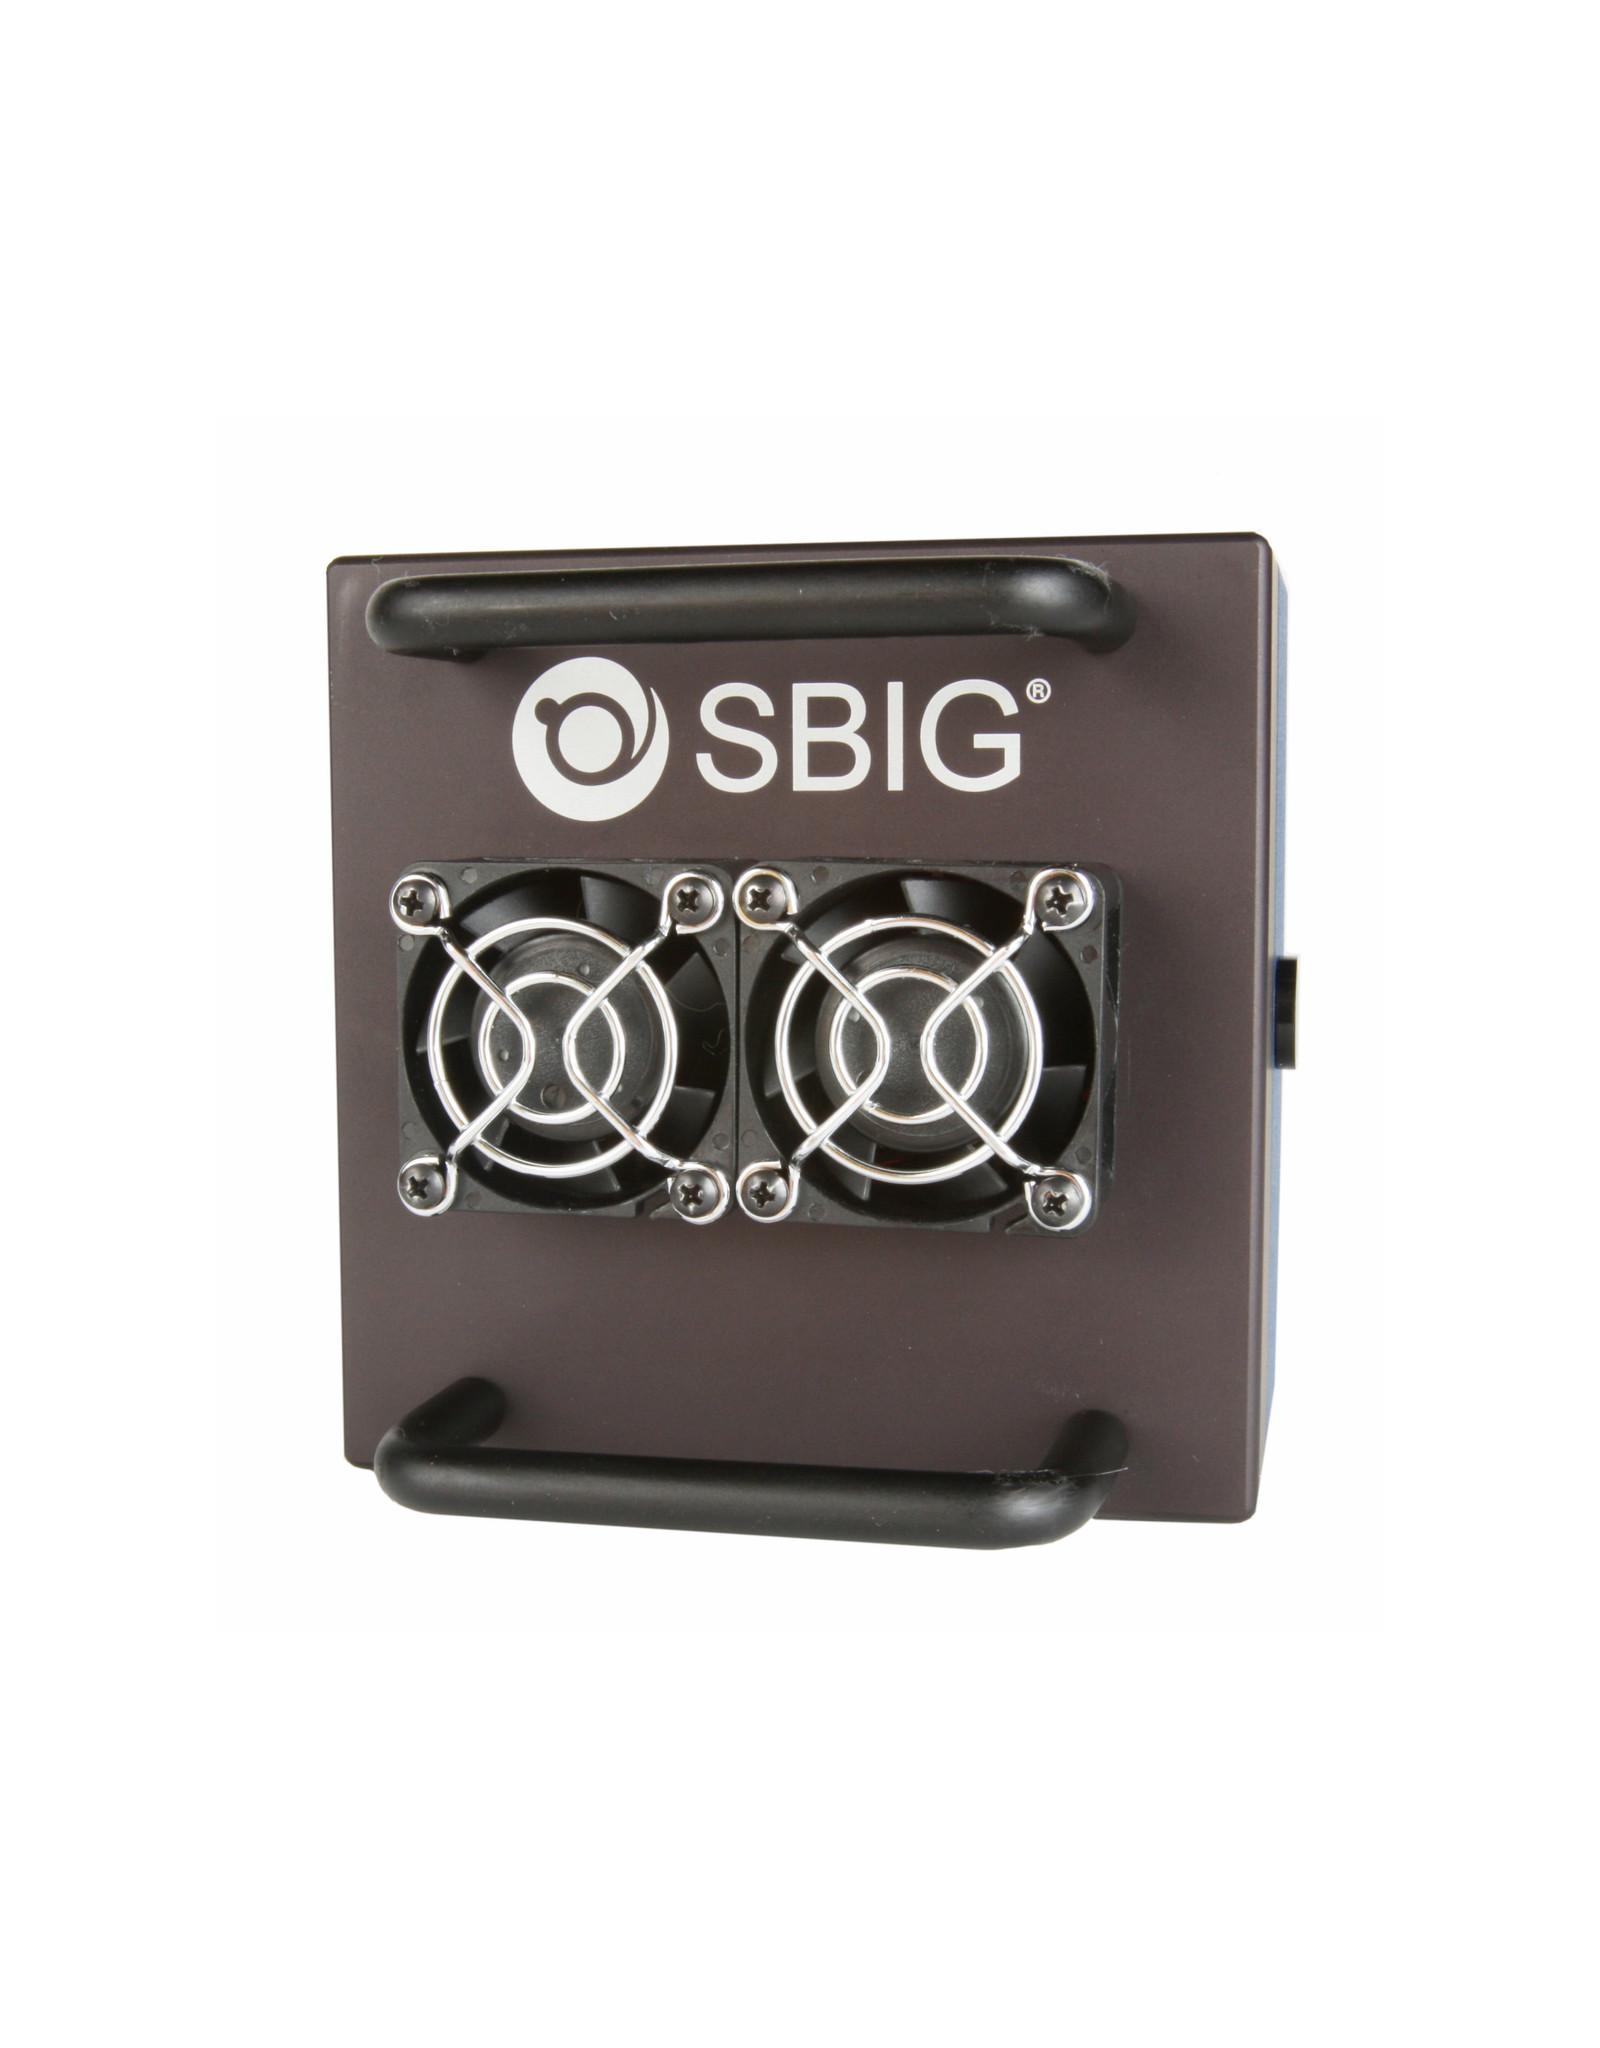 SBIG SBig Aluma 77-00 USB  back-illuminated Camera